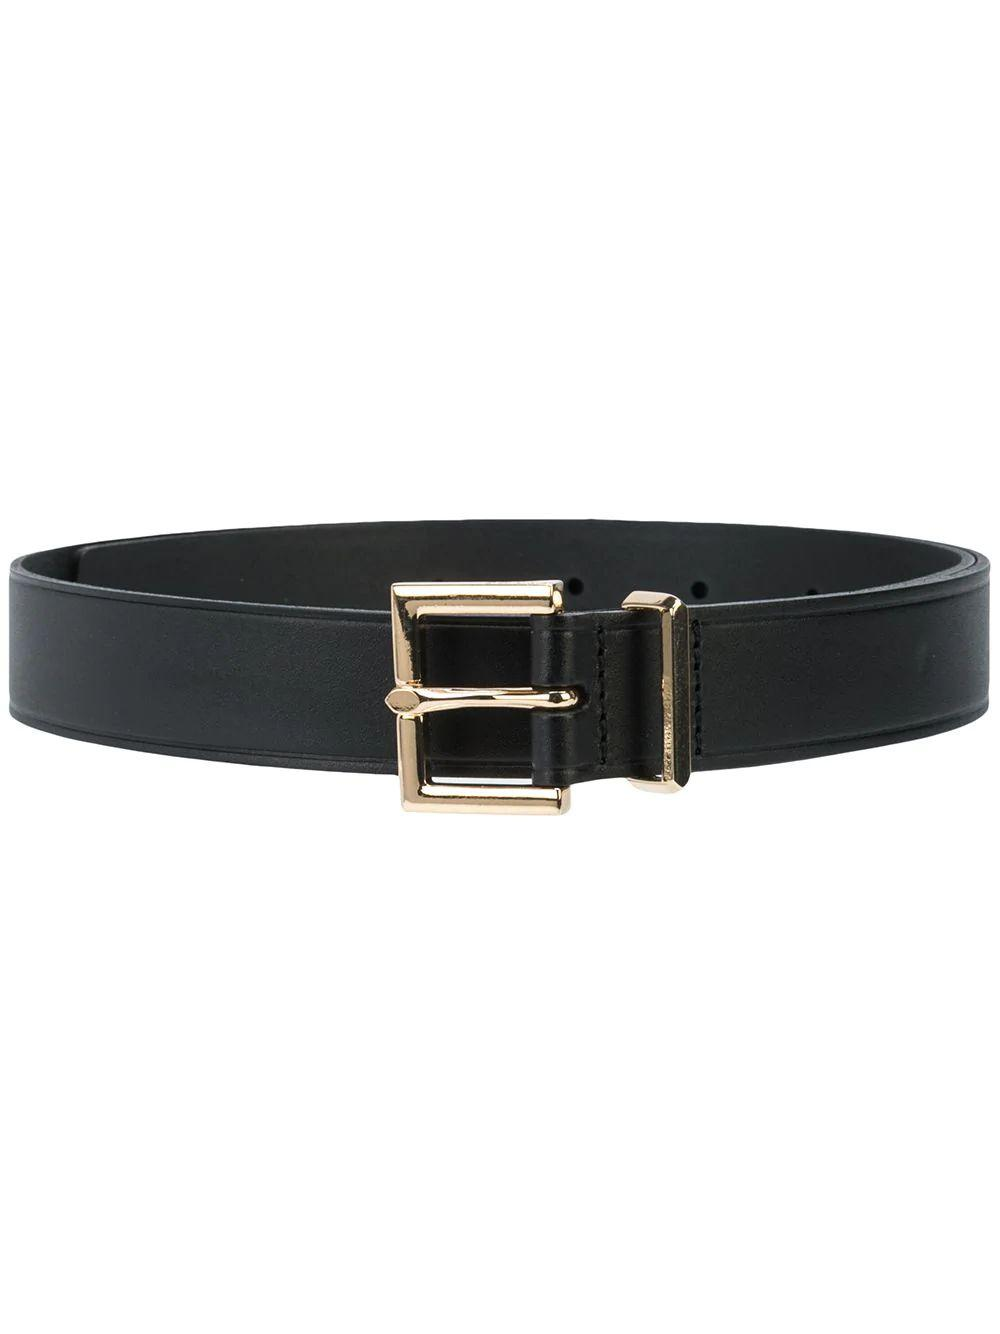 Square Buckle Belt Item # LWBT0120